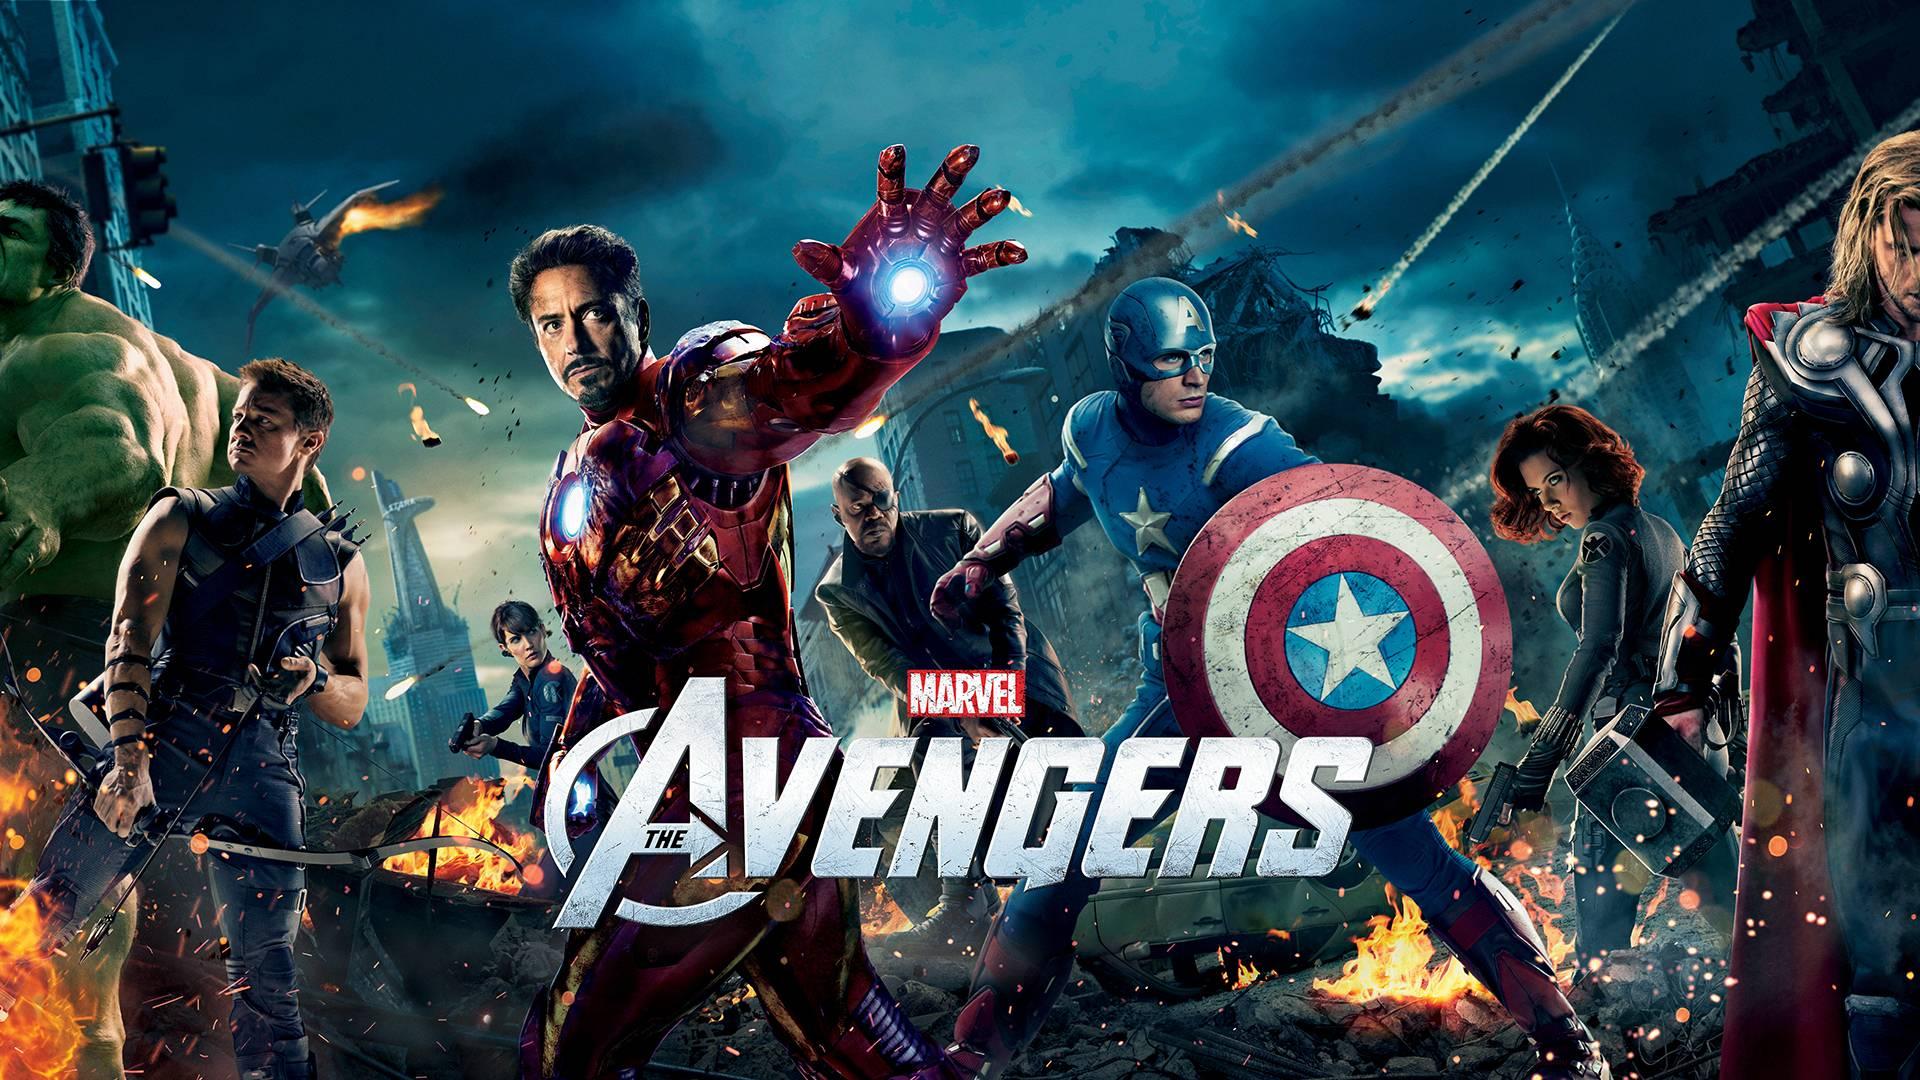 Marvel The Avengers Wallpapers Top Free Marvel The Avengers